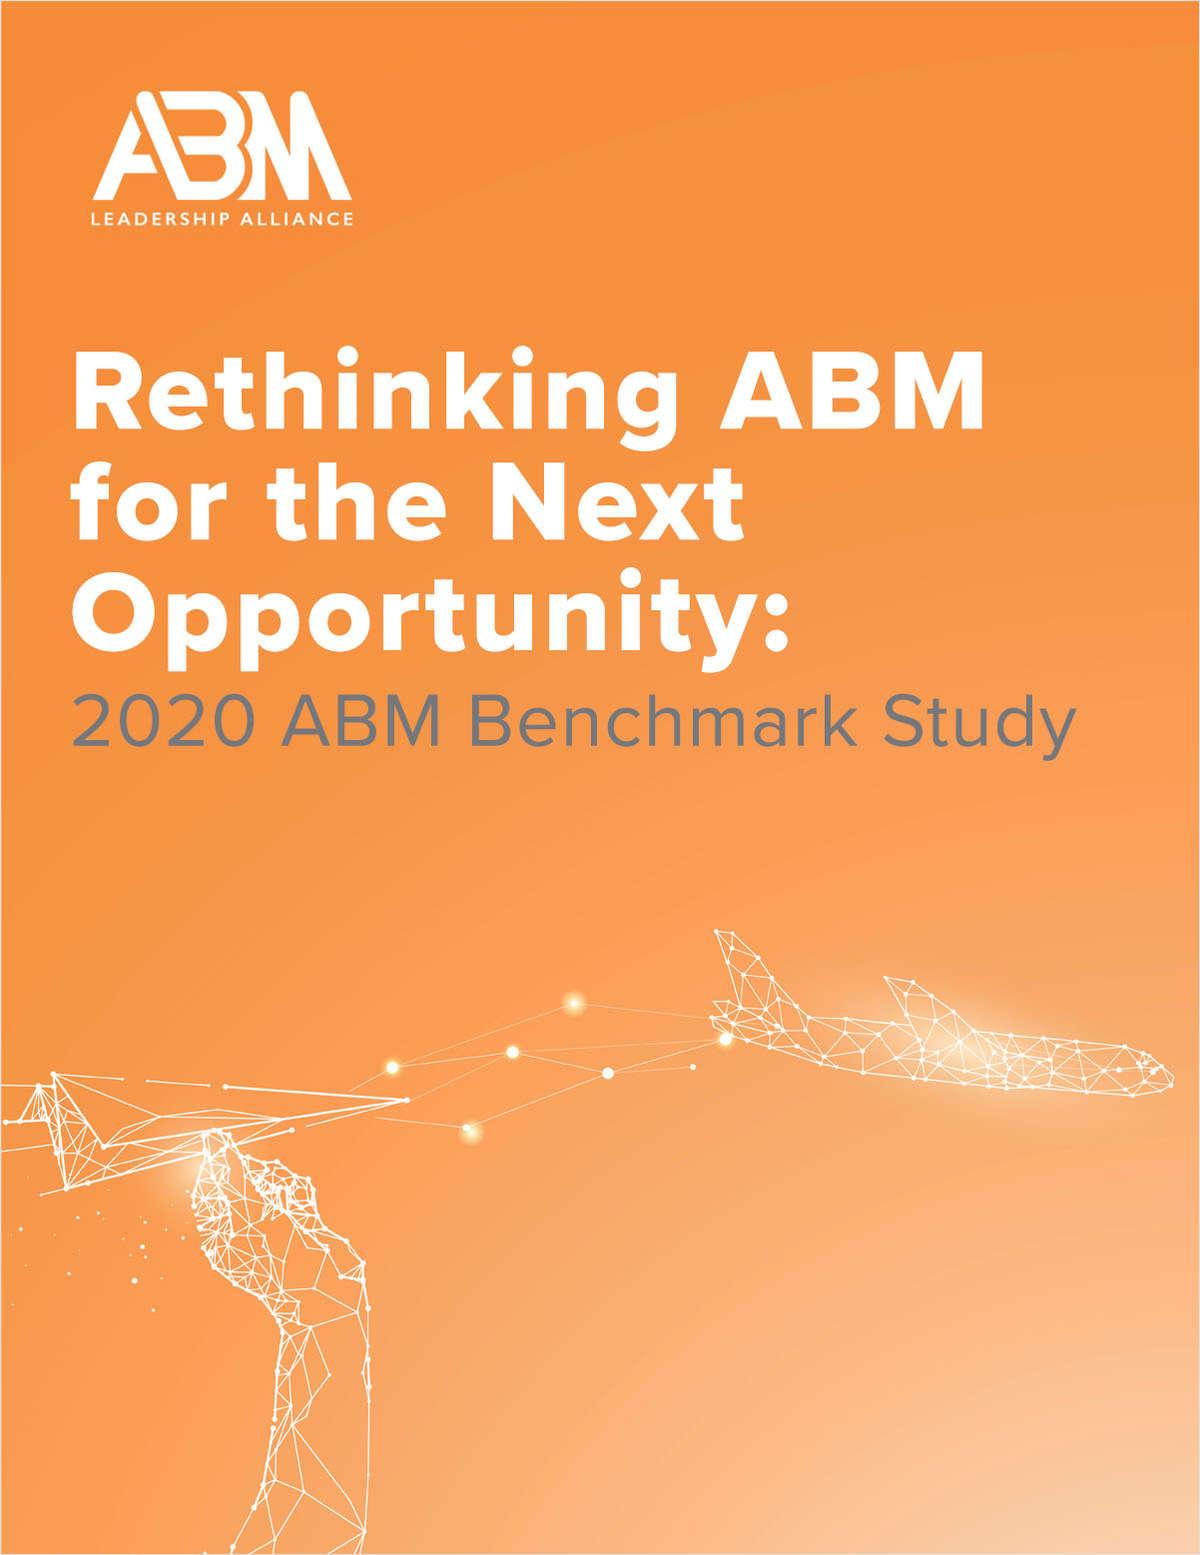 2020 ABM Benchmark Study: Rethinking ABM for the Next Opportunity